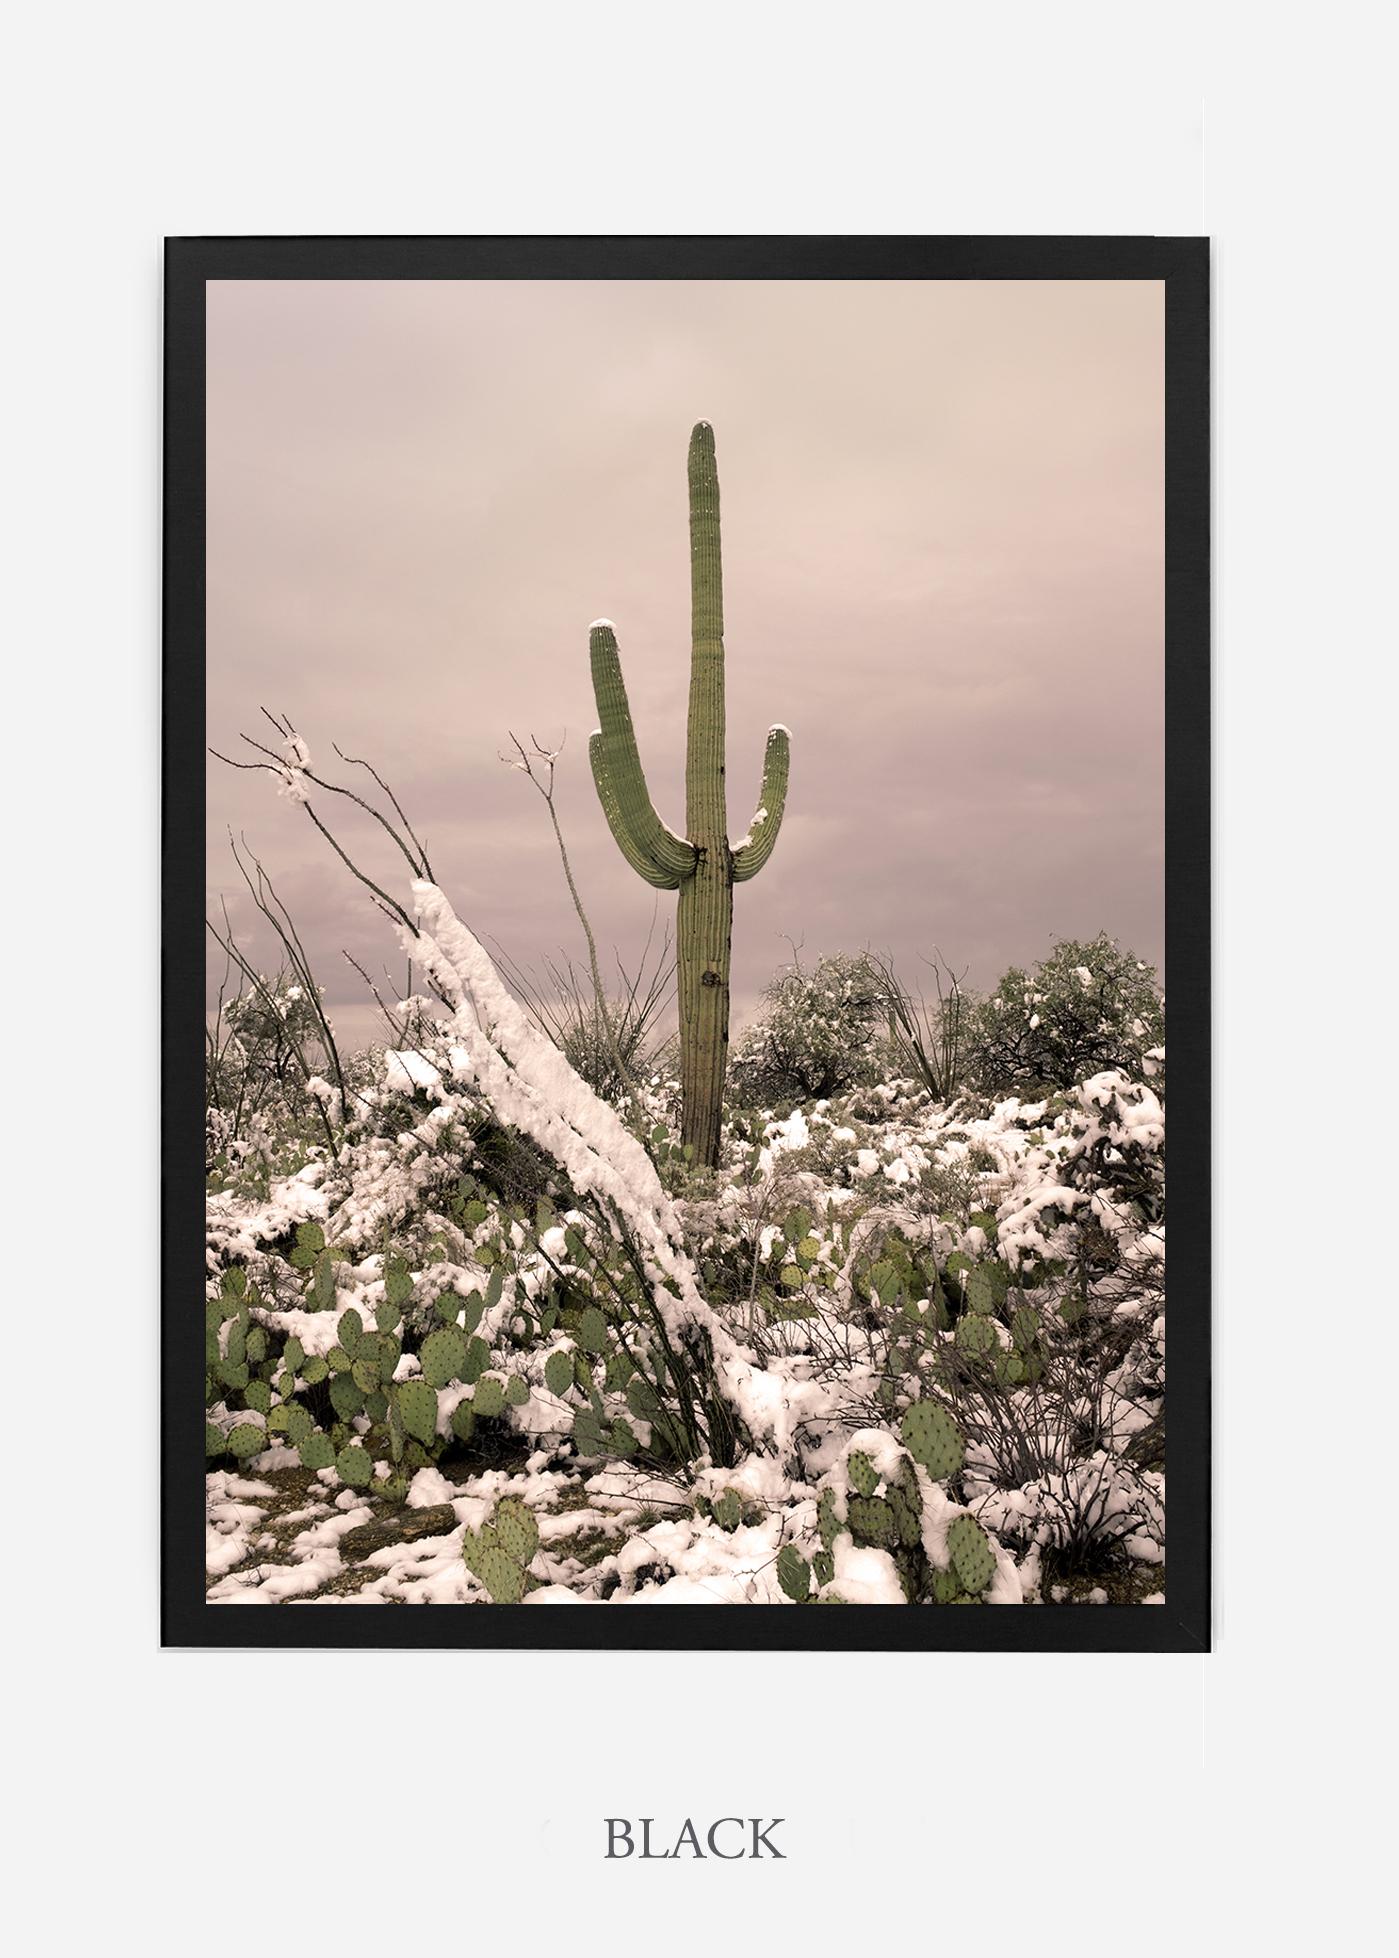 nomat-blackframe-saguaroNo.4-wildercalifornia-art-wallart-cactusprint-homedecor-prints-arizona-botanical-artwork-interiordesign.jpg